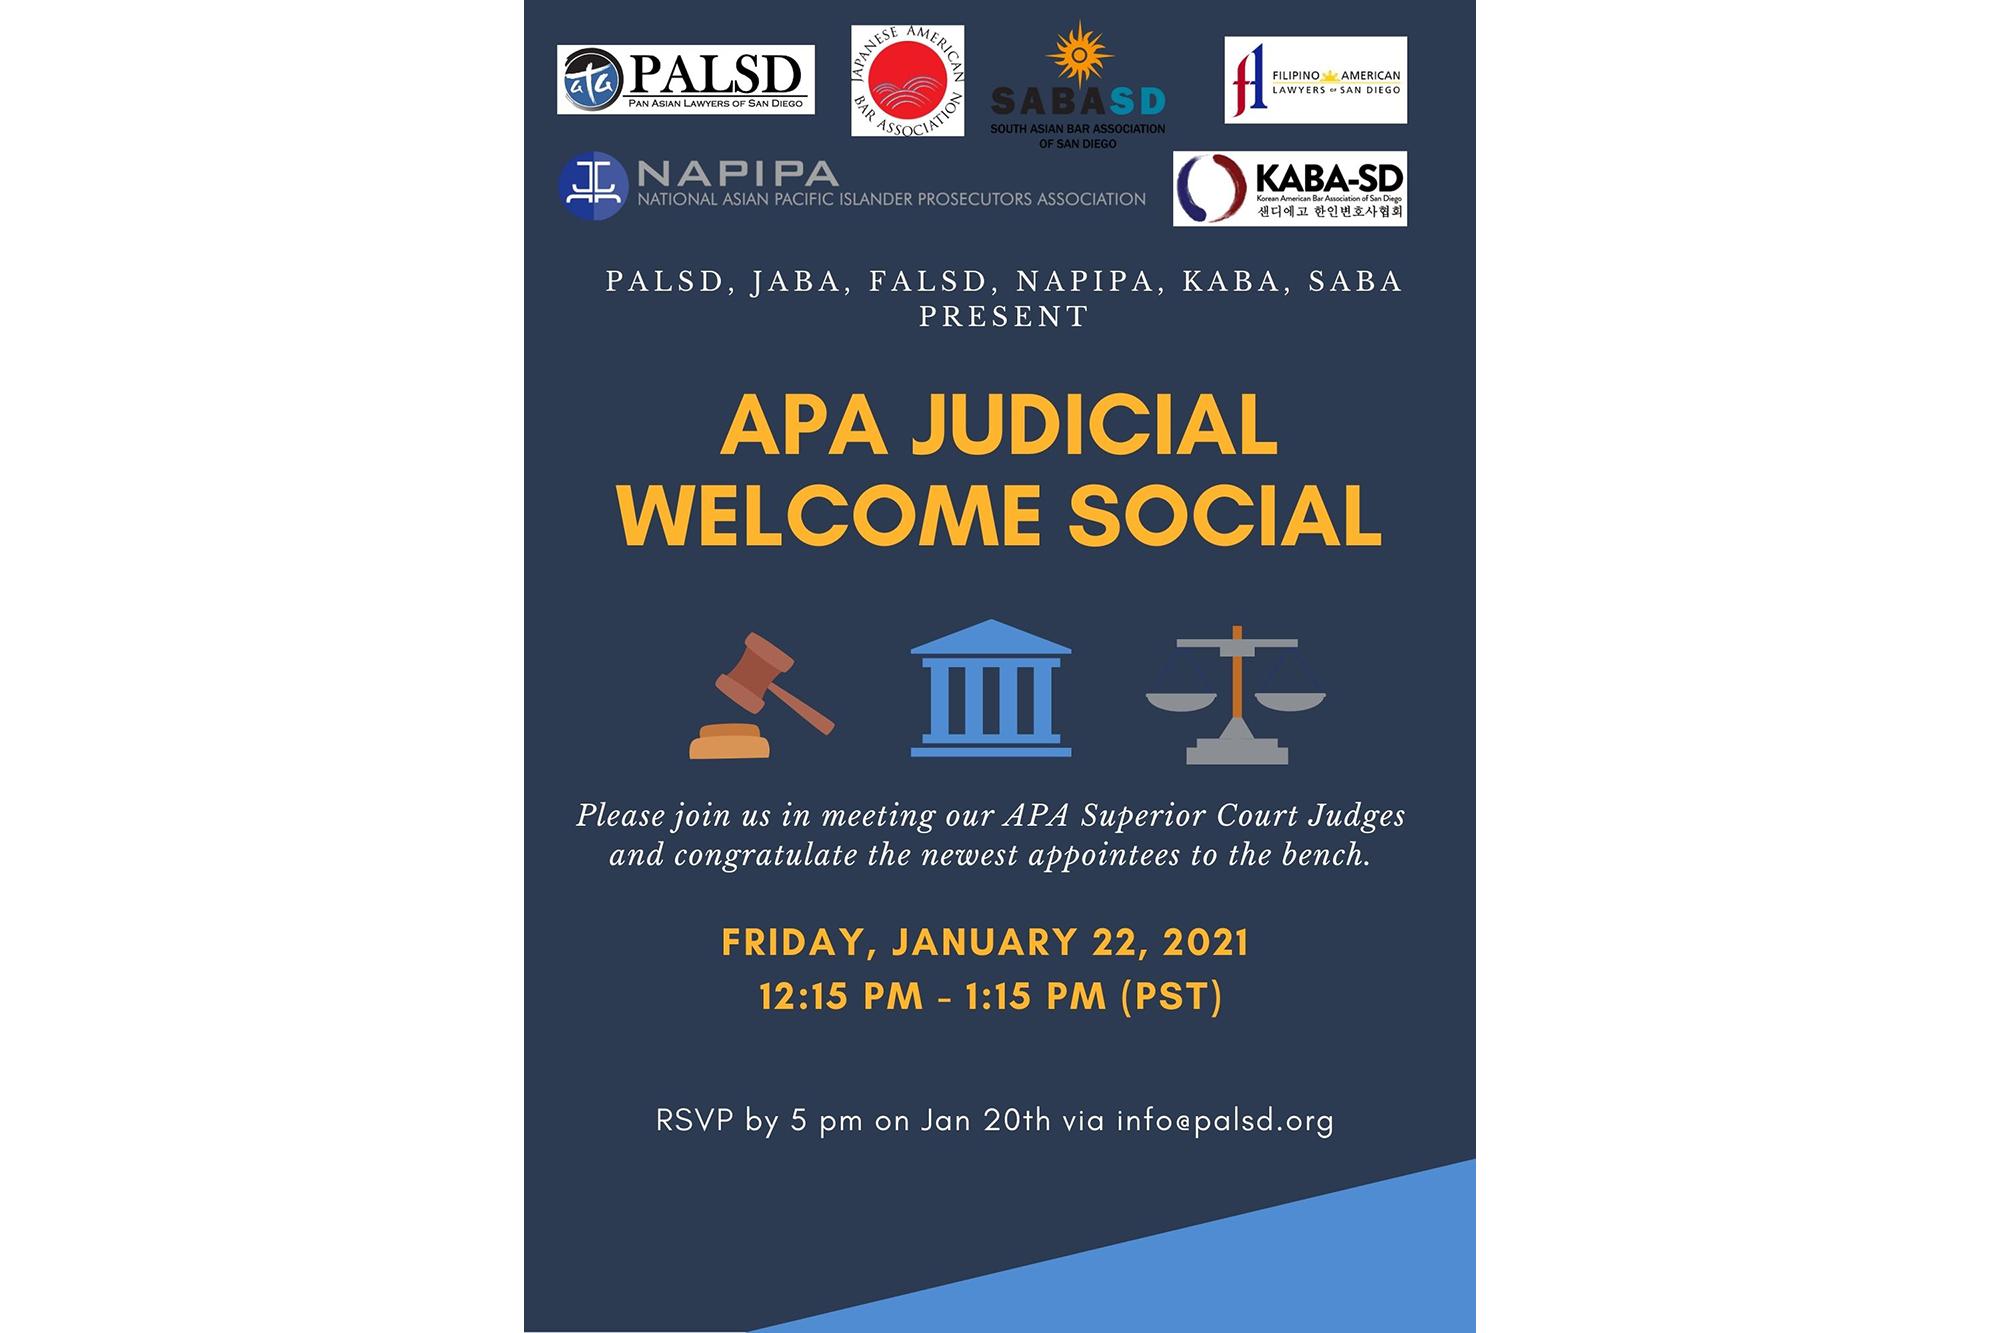 APA Judicial Welcome Social